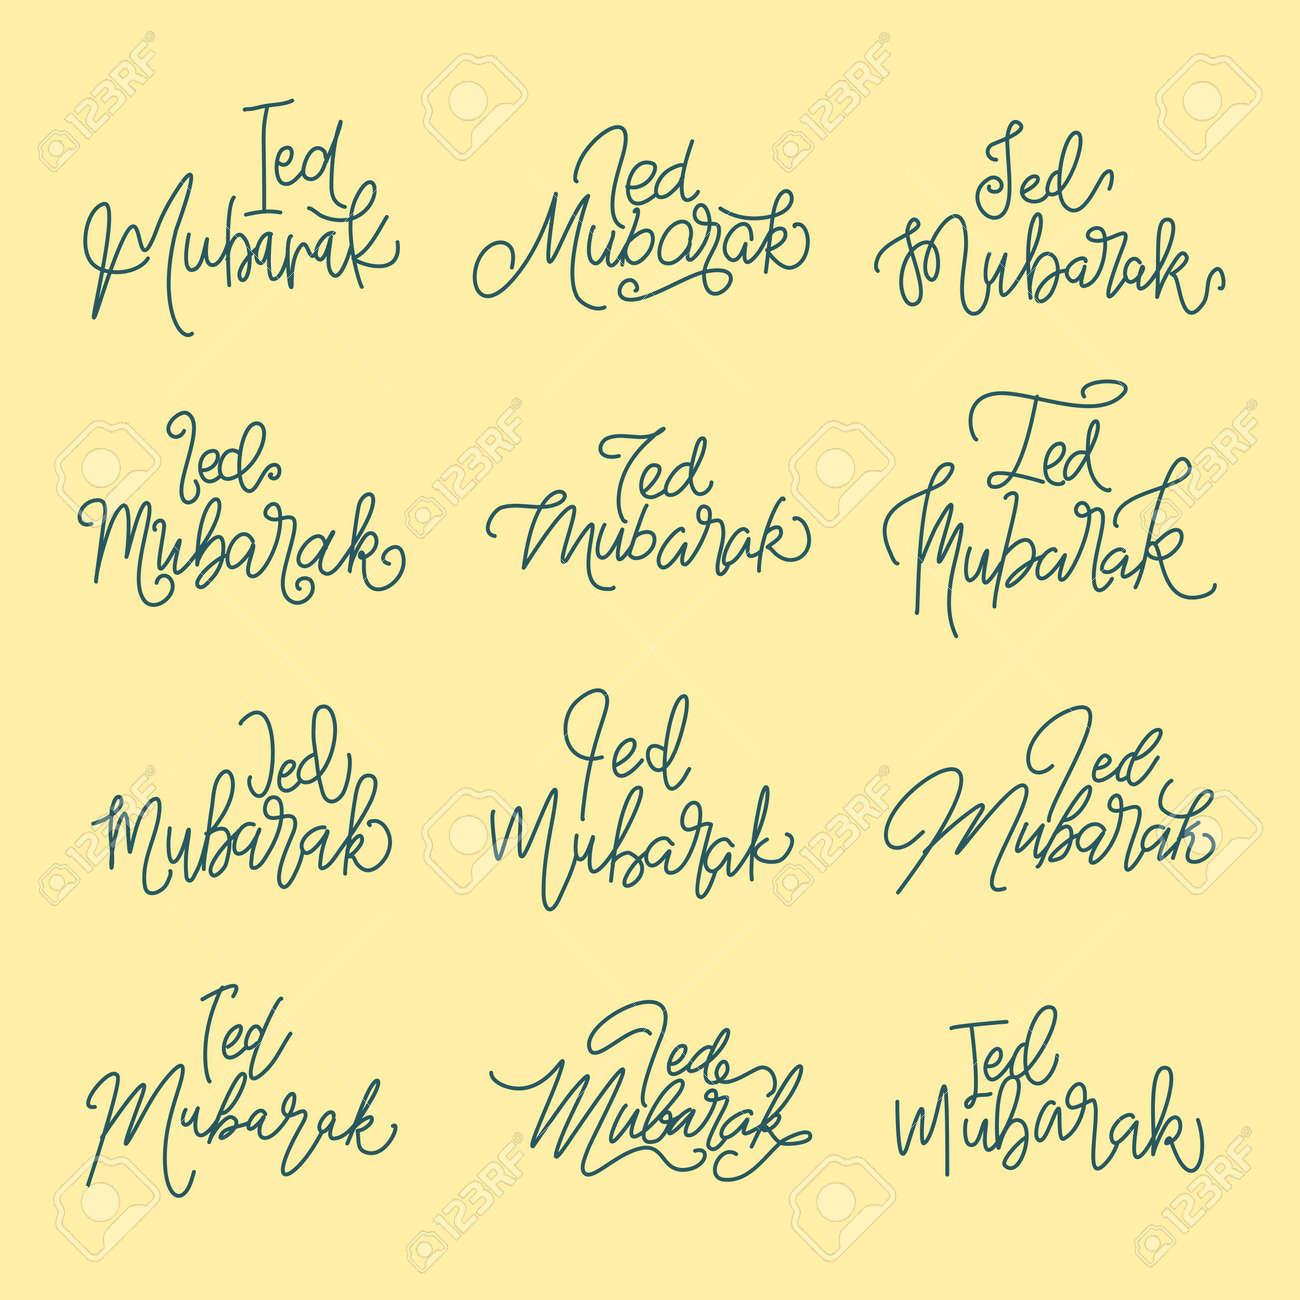 Eid Mubarak. Set of hand written calligraphy for end of Ramadan. Eid Mubarak lettering. - 167718293